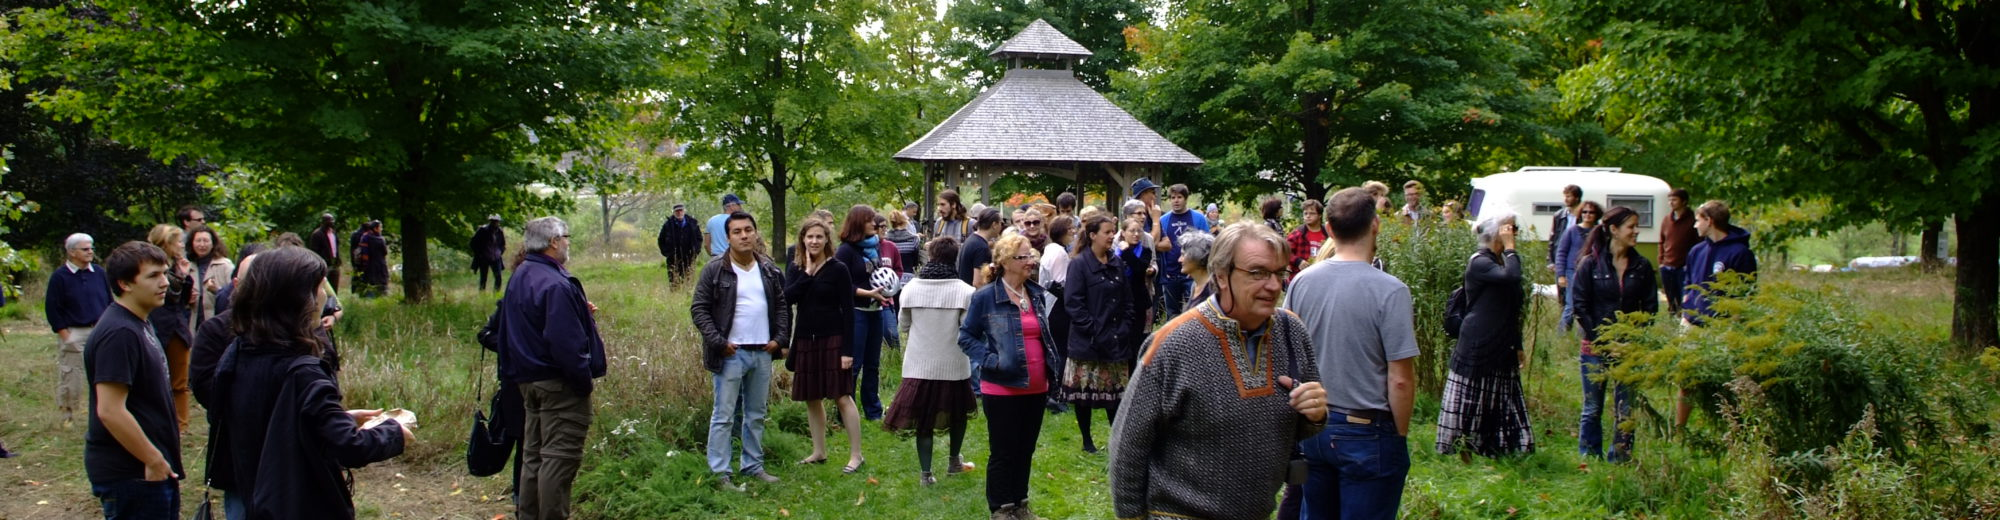 symposium d'art/nature: moncton 2016